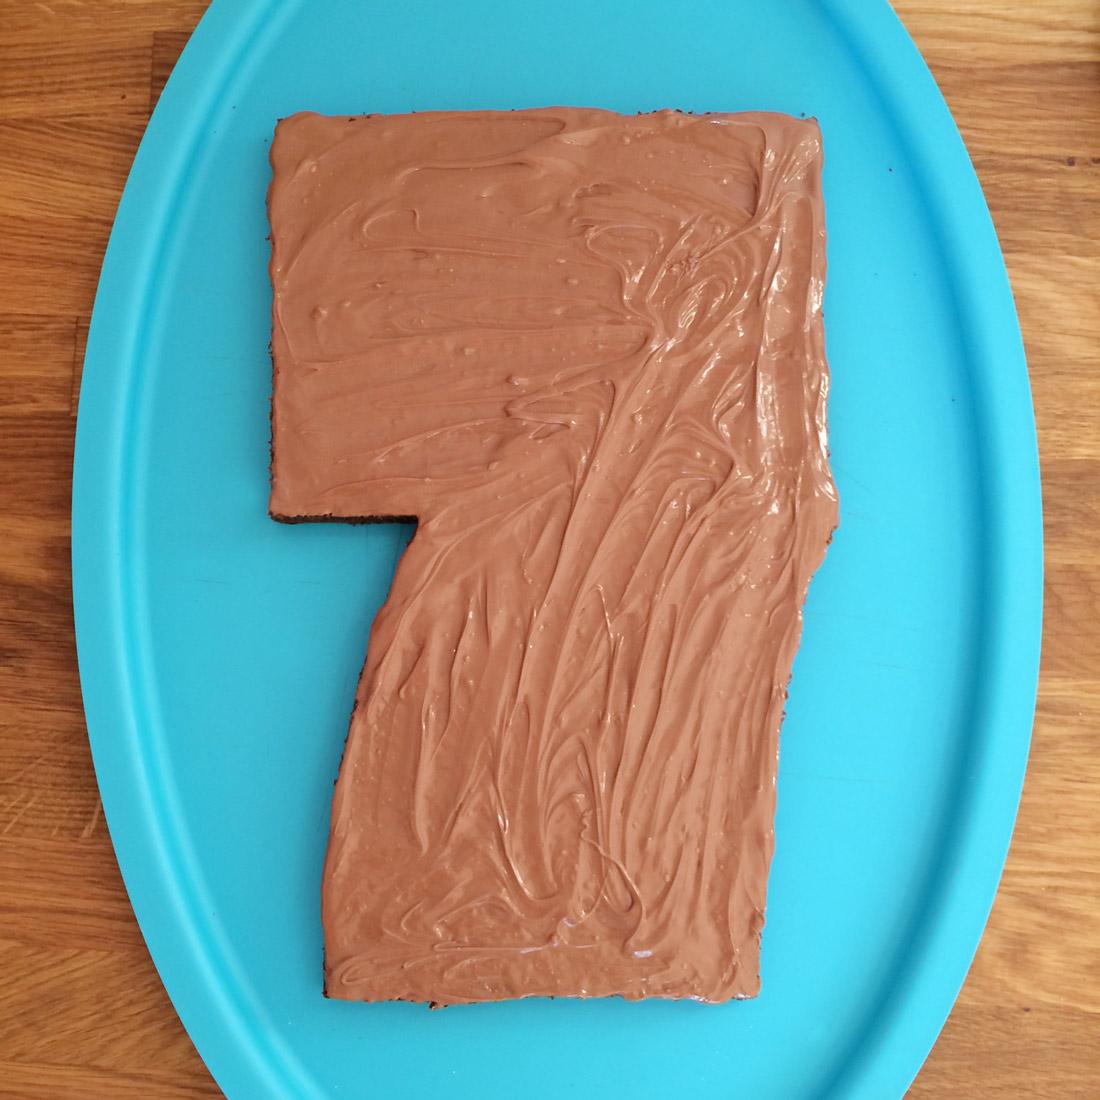 Geburtstagskuchen Zubereitung Schritt 15